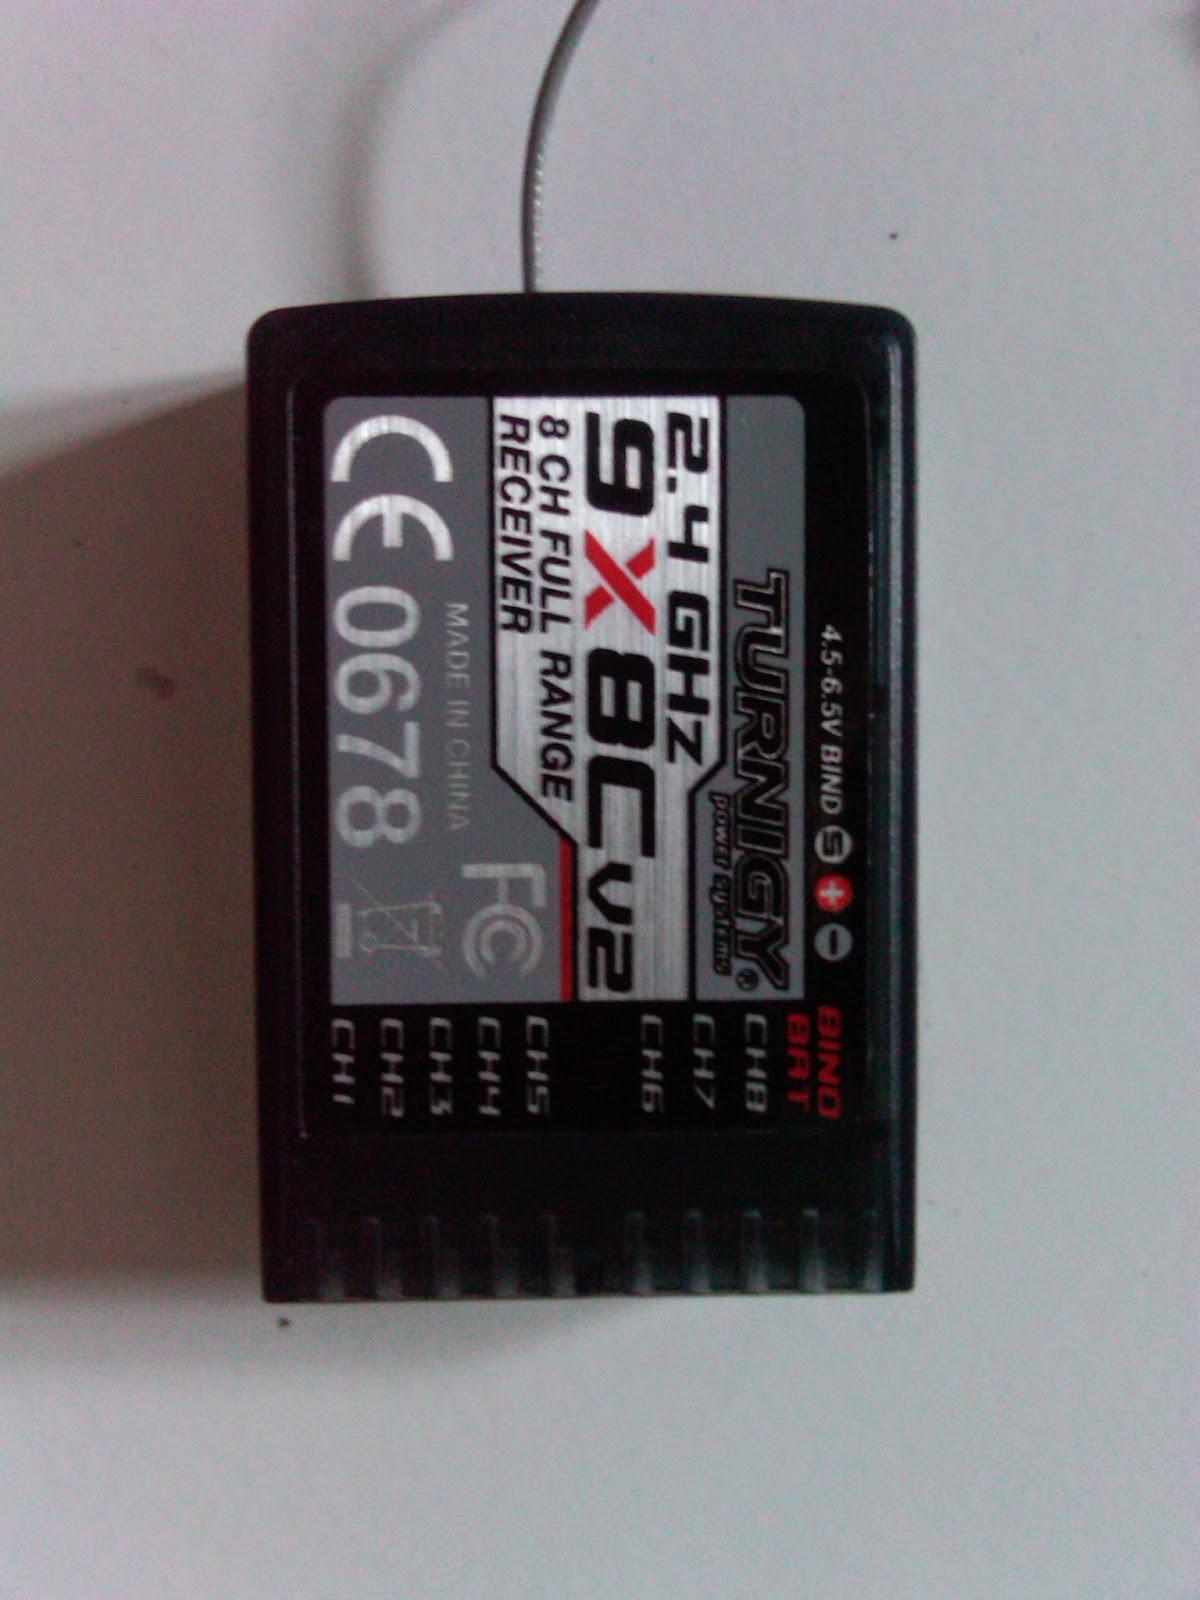 Turnigy 9x v2 manual free download